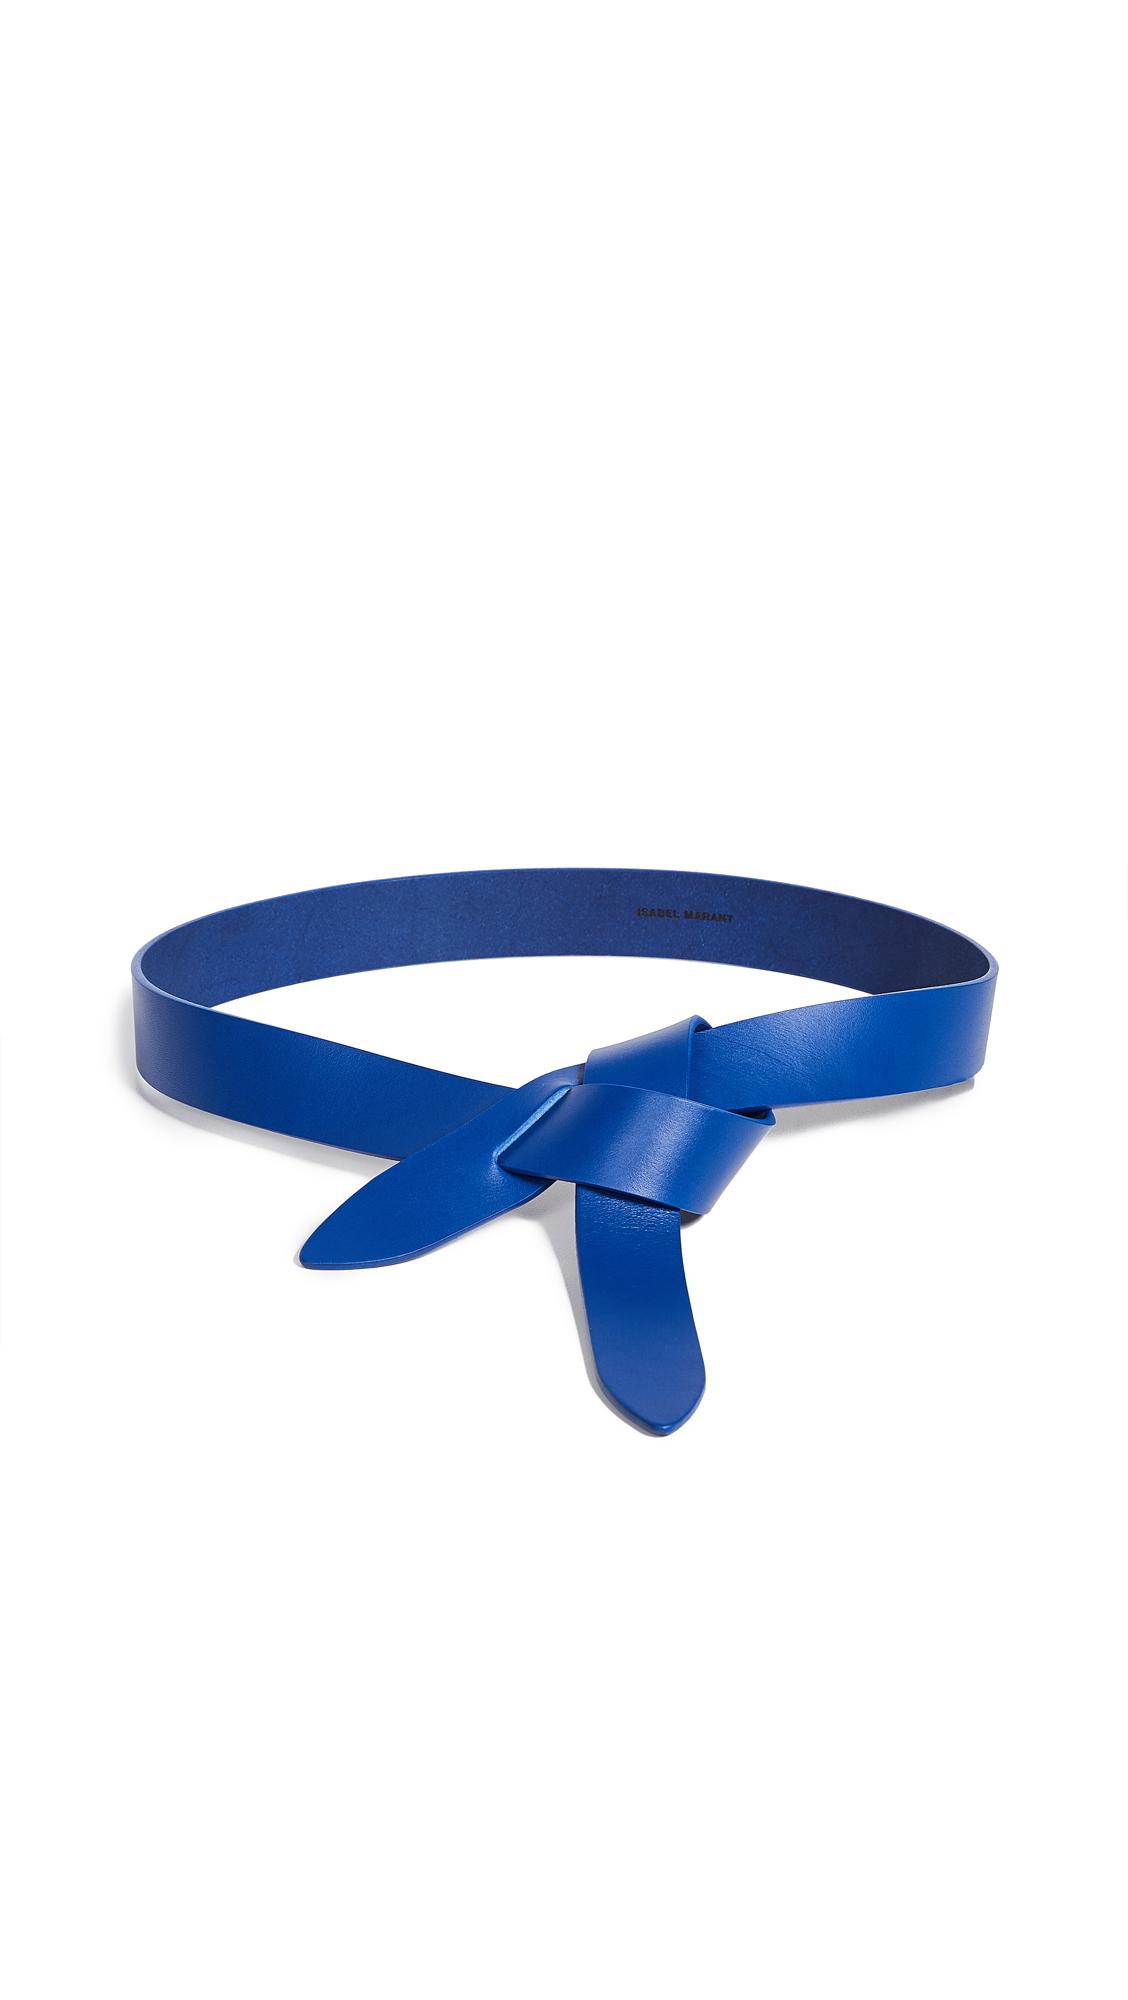 Isabel Marant Lecce Belt - Electric Blue